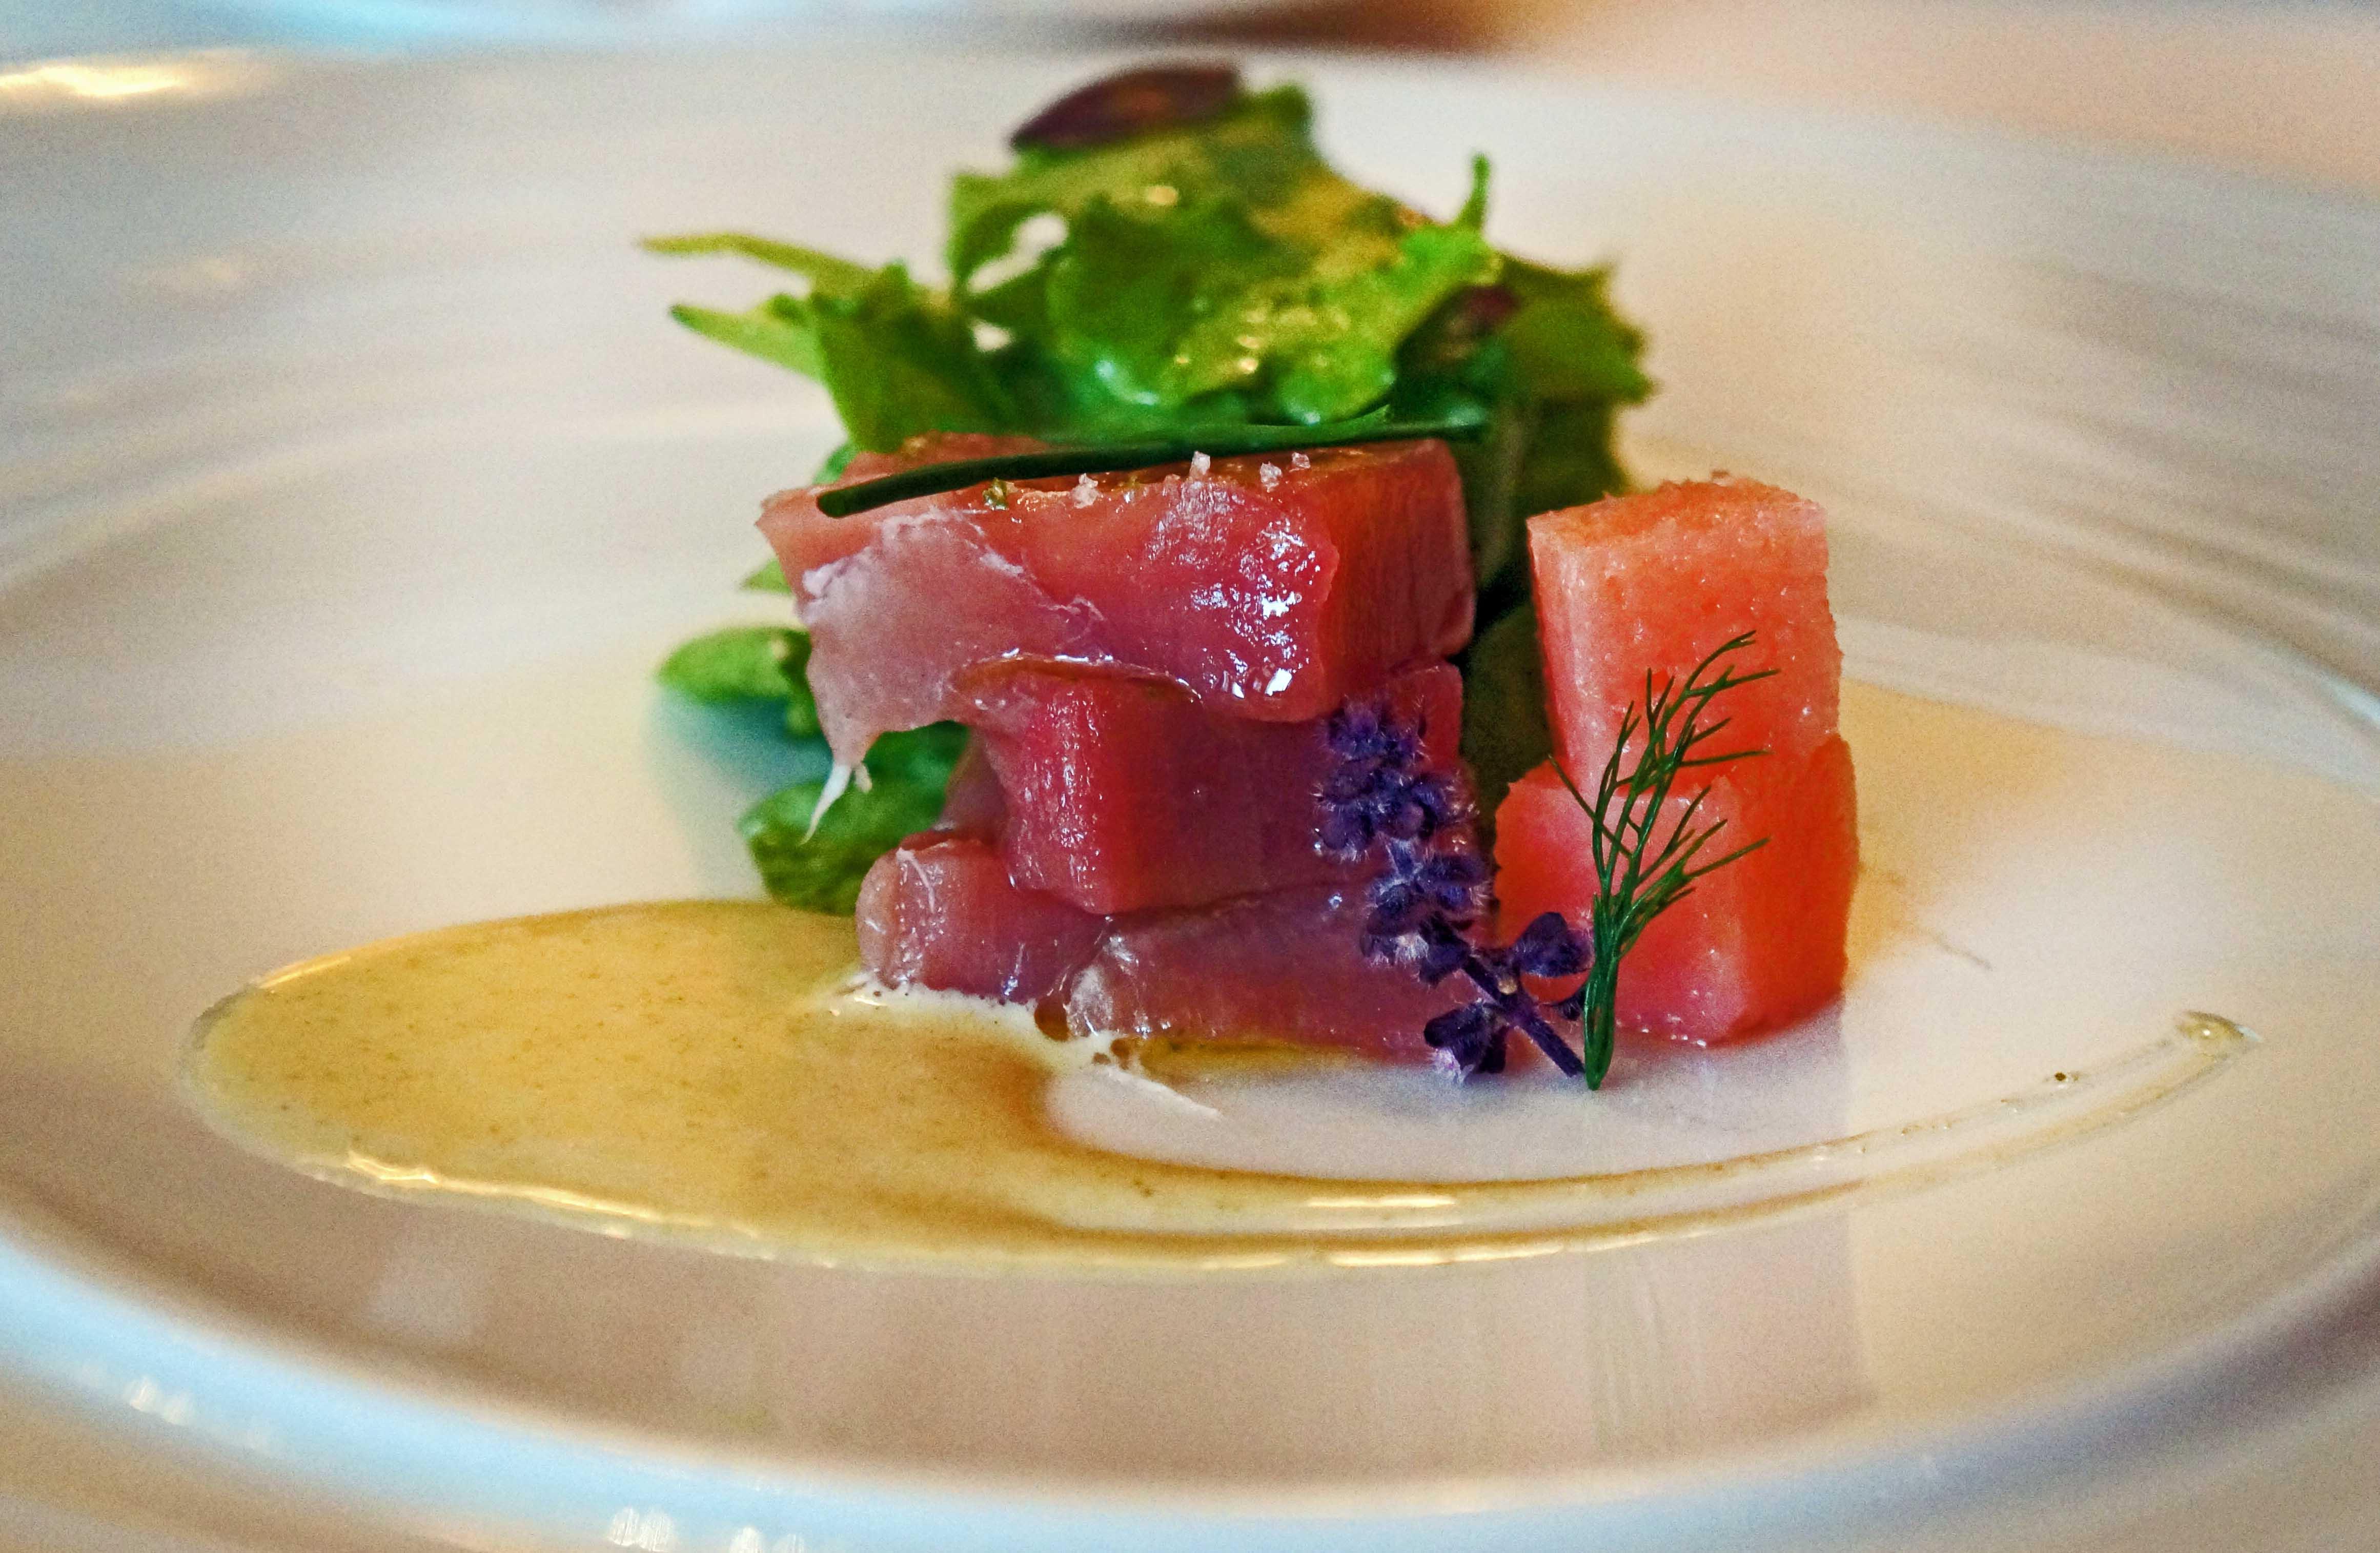 jadranska tuna, vasabi sos, đumbir